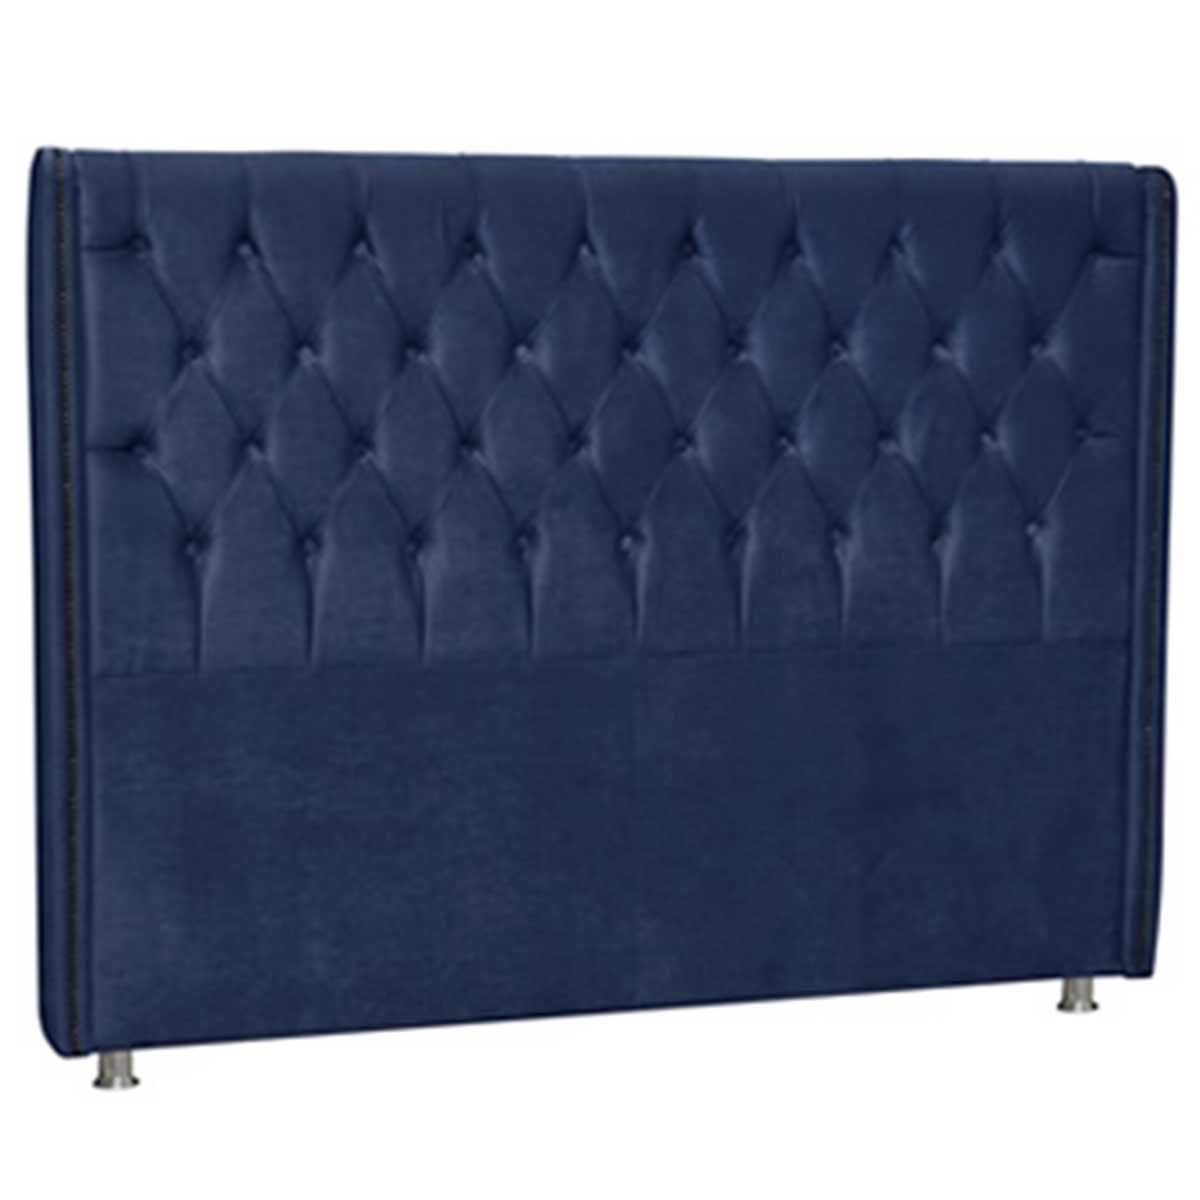 Cabeceira Firenze Casal 140 cm Azul Escuro Perfan Móveis